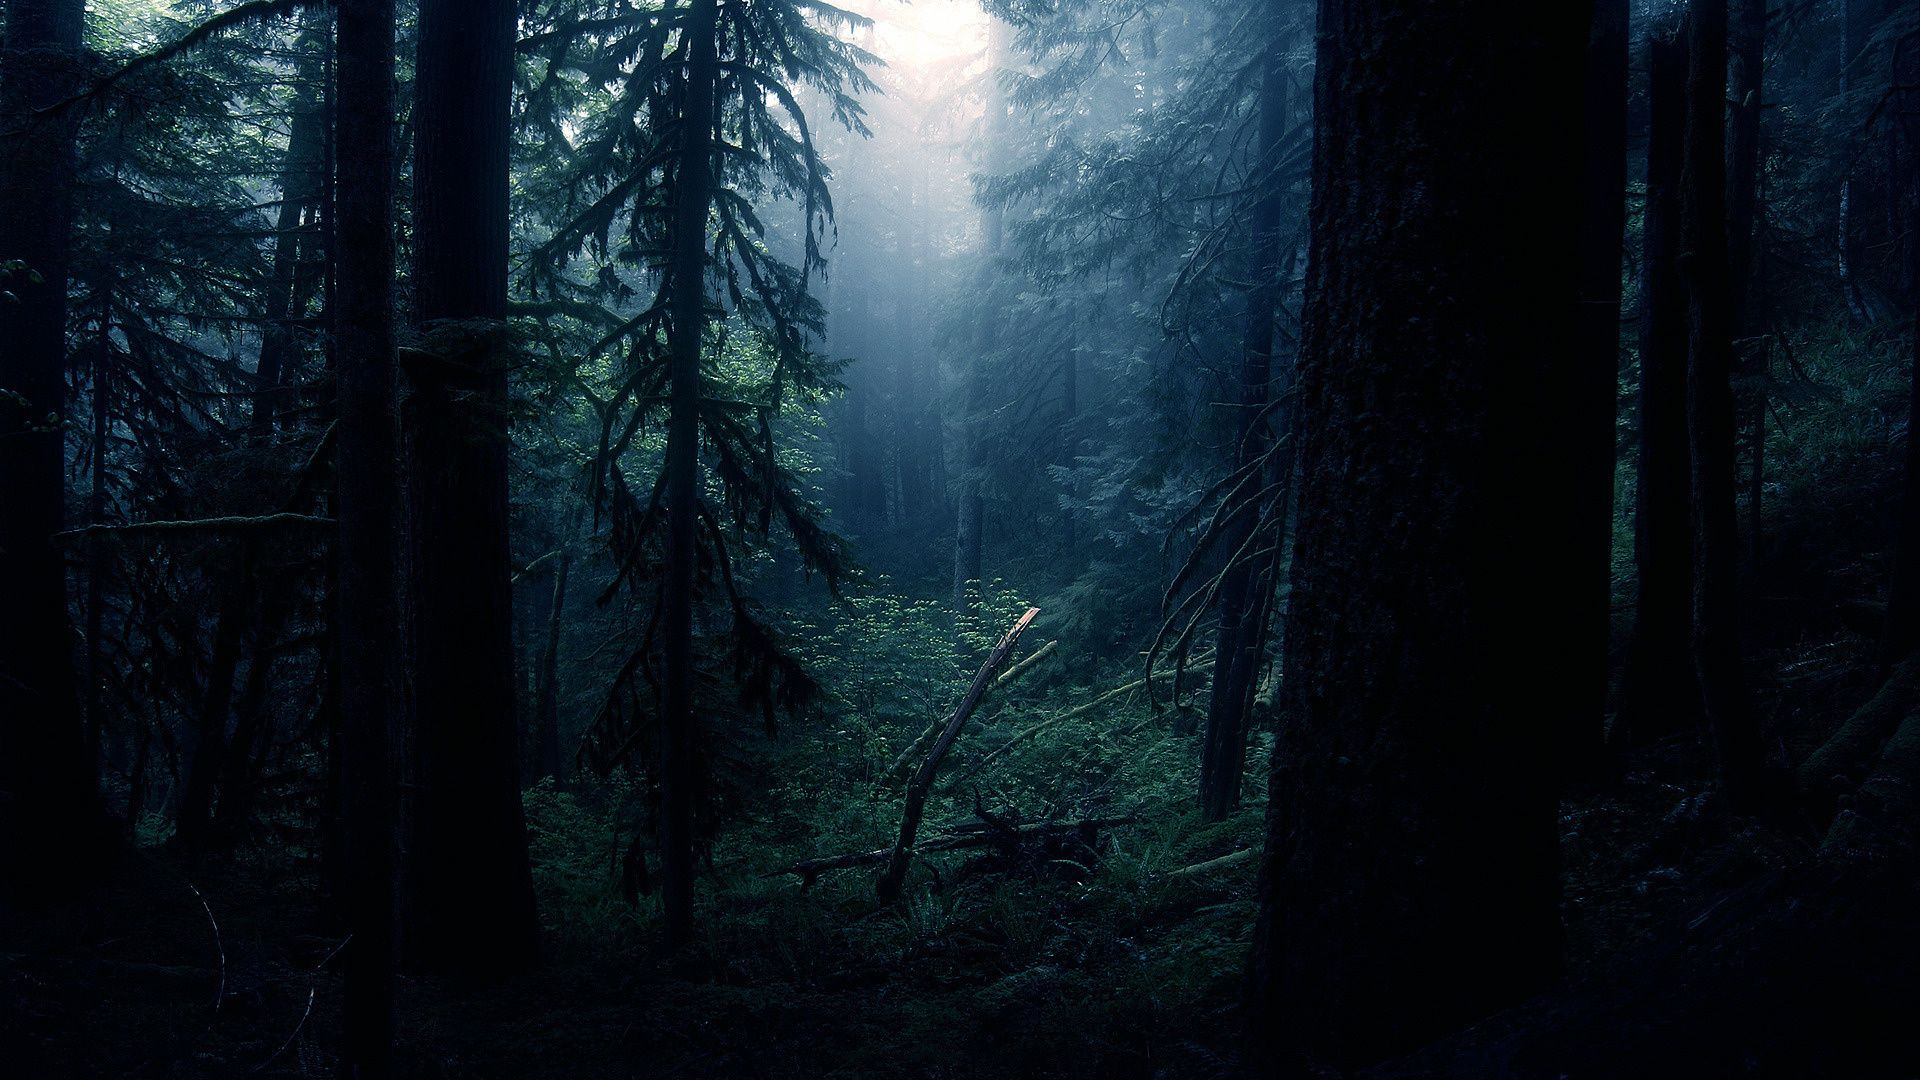 Pin By Jakub Tibensky On Dungeons Dragons Forest Wallpaper Dark Wood Wallpaper Temperate Rainforest